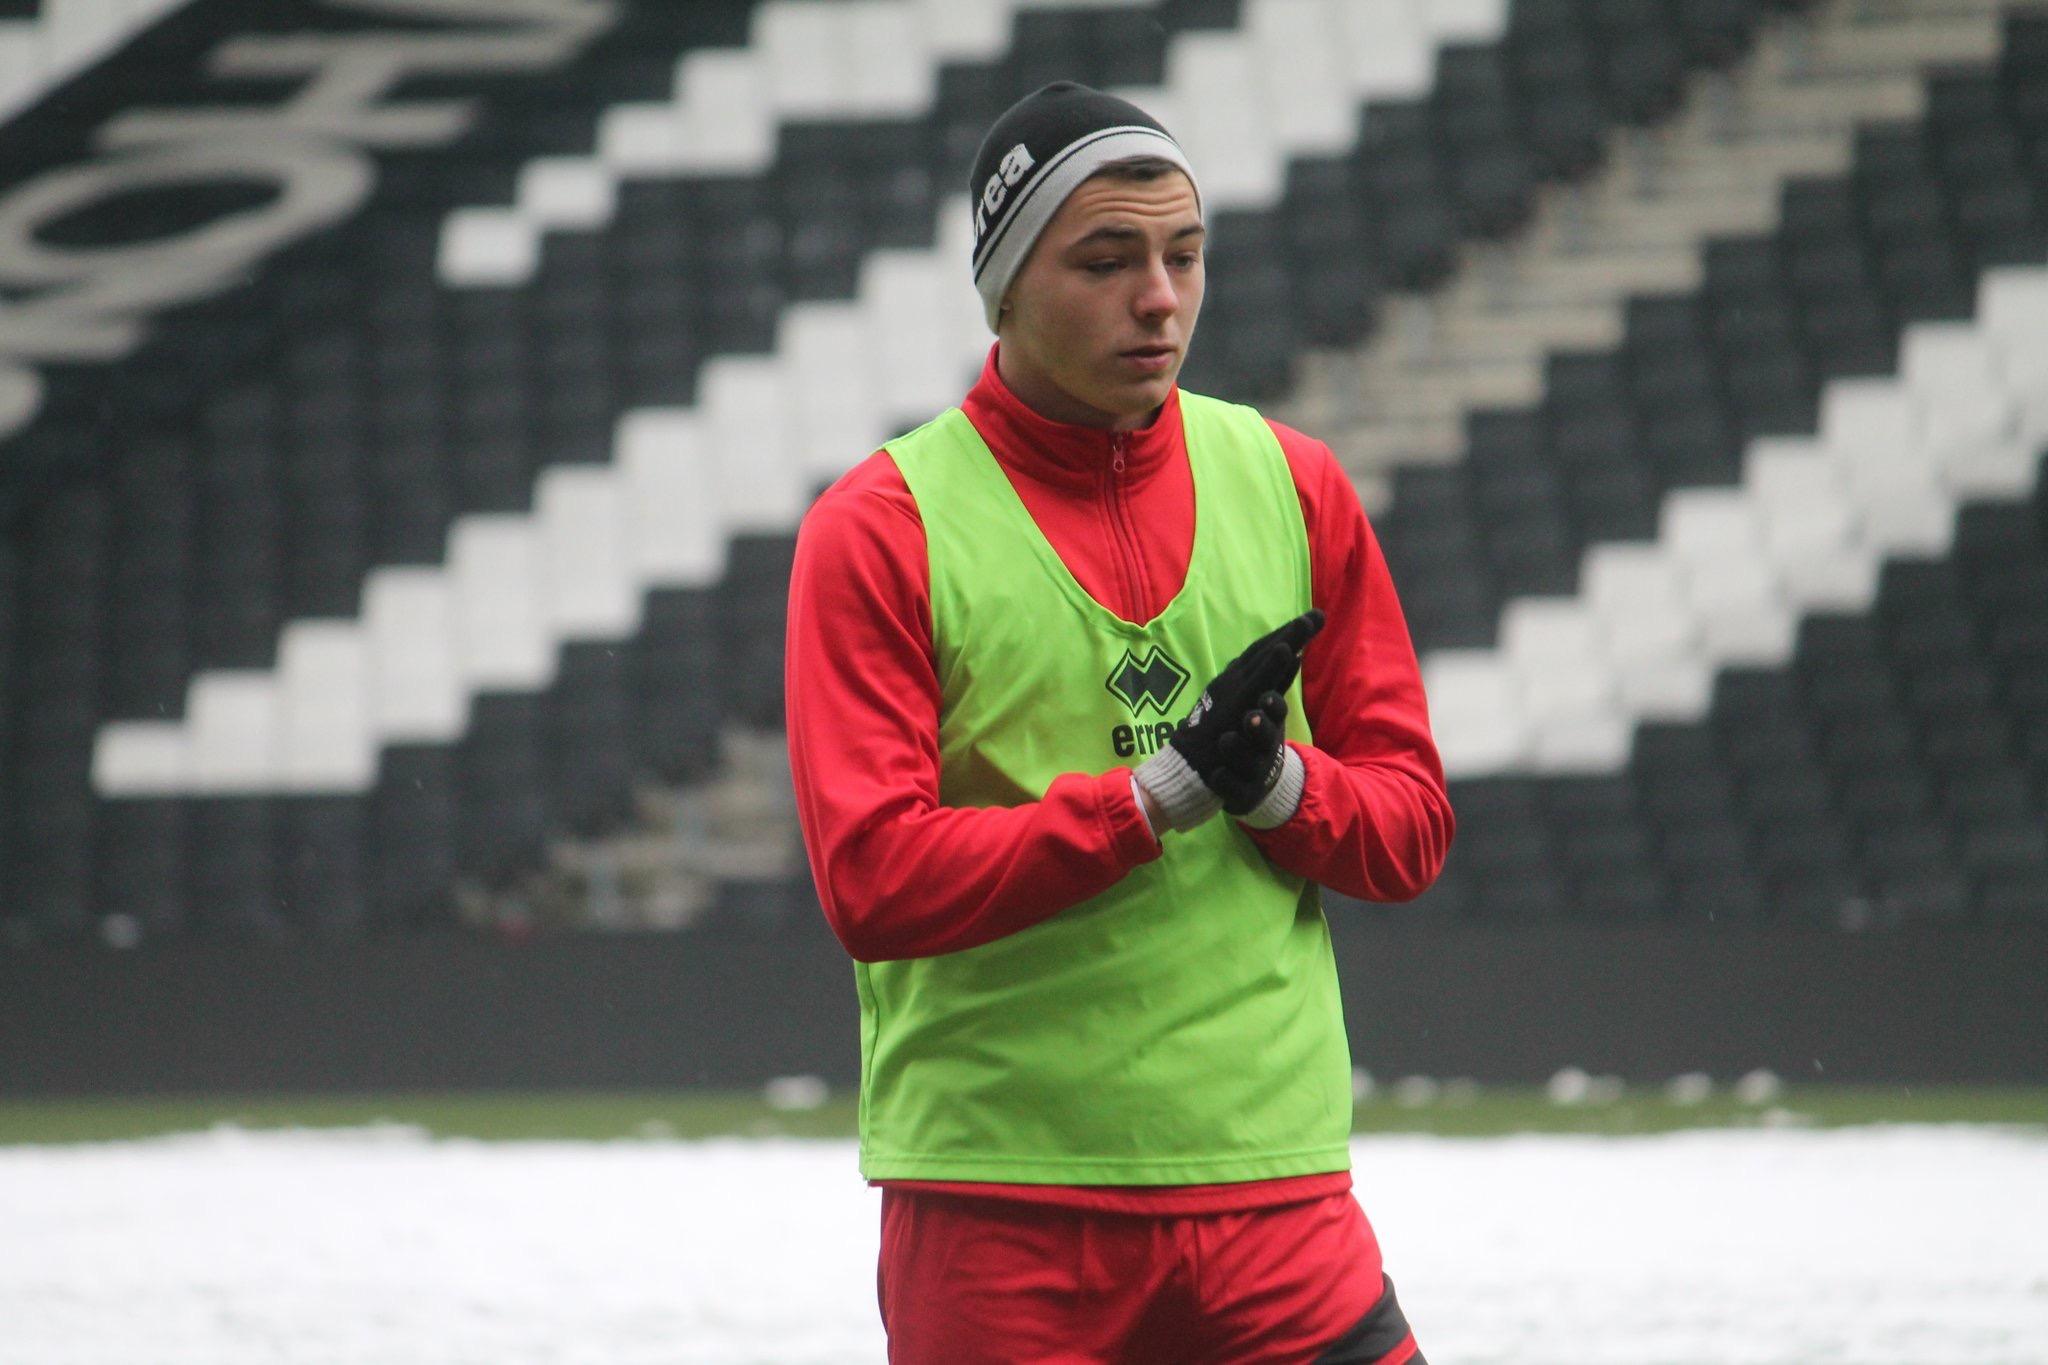 Ste Walker signs for MK Dons on loan